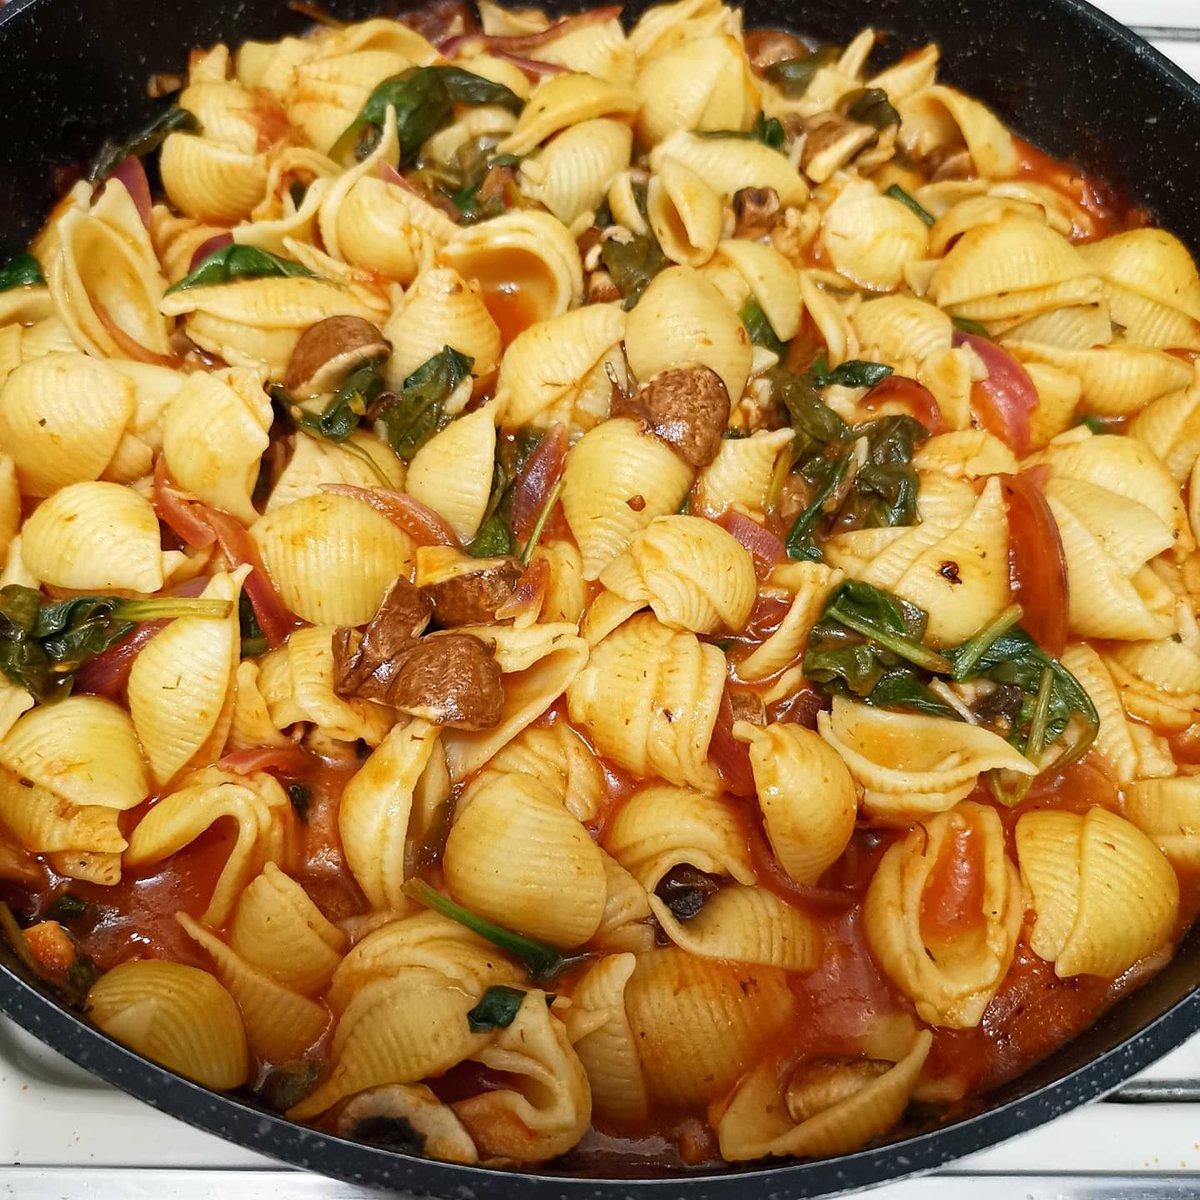 Vegan Pasta #vegan #pasta #comfortfood #lunch #almuerzo #organic #homemade #foodie #healthy #fitness #lifestyle #coffee #tea #abendessen #StayAtHome #eatathome #mushrooms #chef #healthyrecipes #料理写真 #おいしい #저녁식사 https://t.co/RQdQ3D4FxB